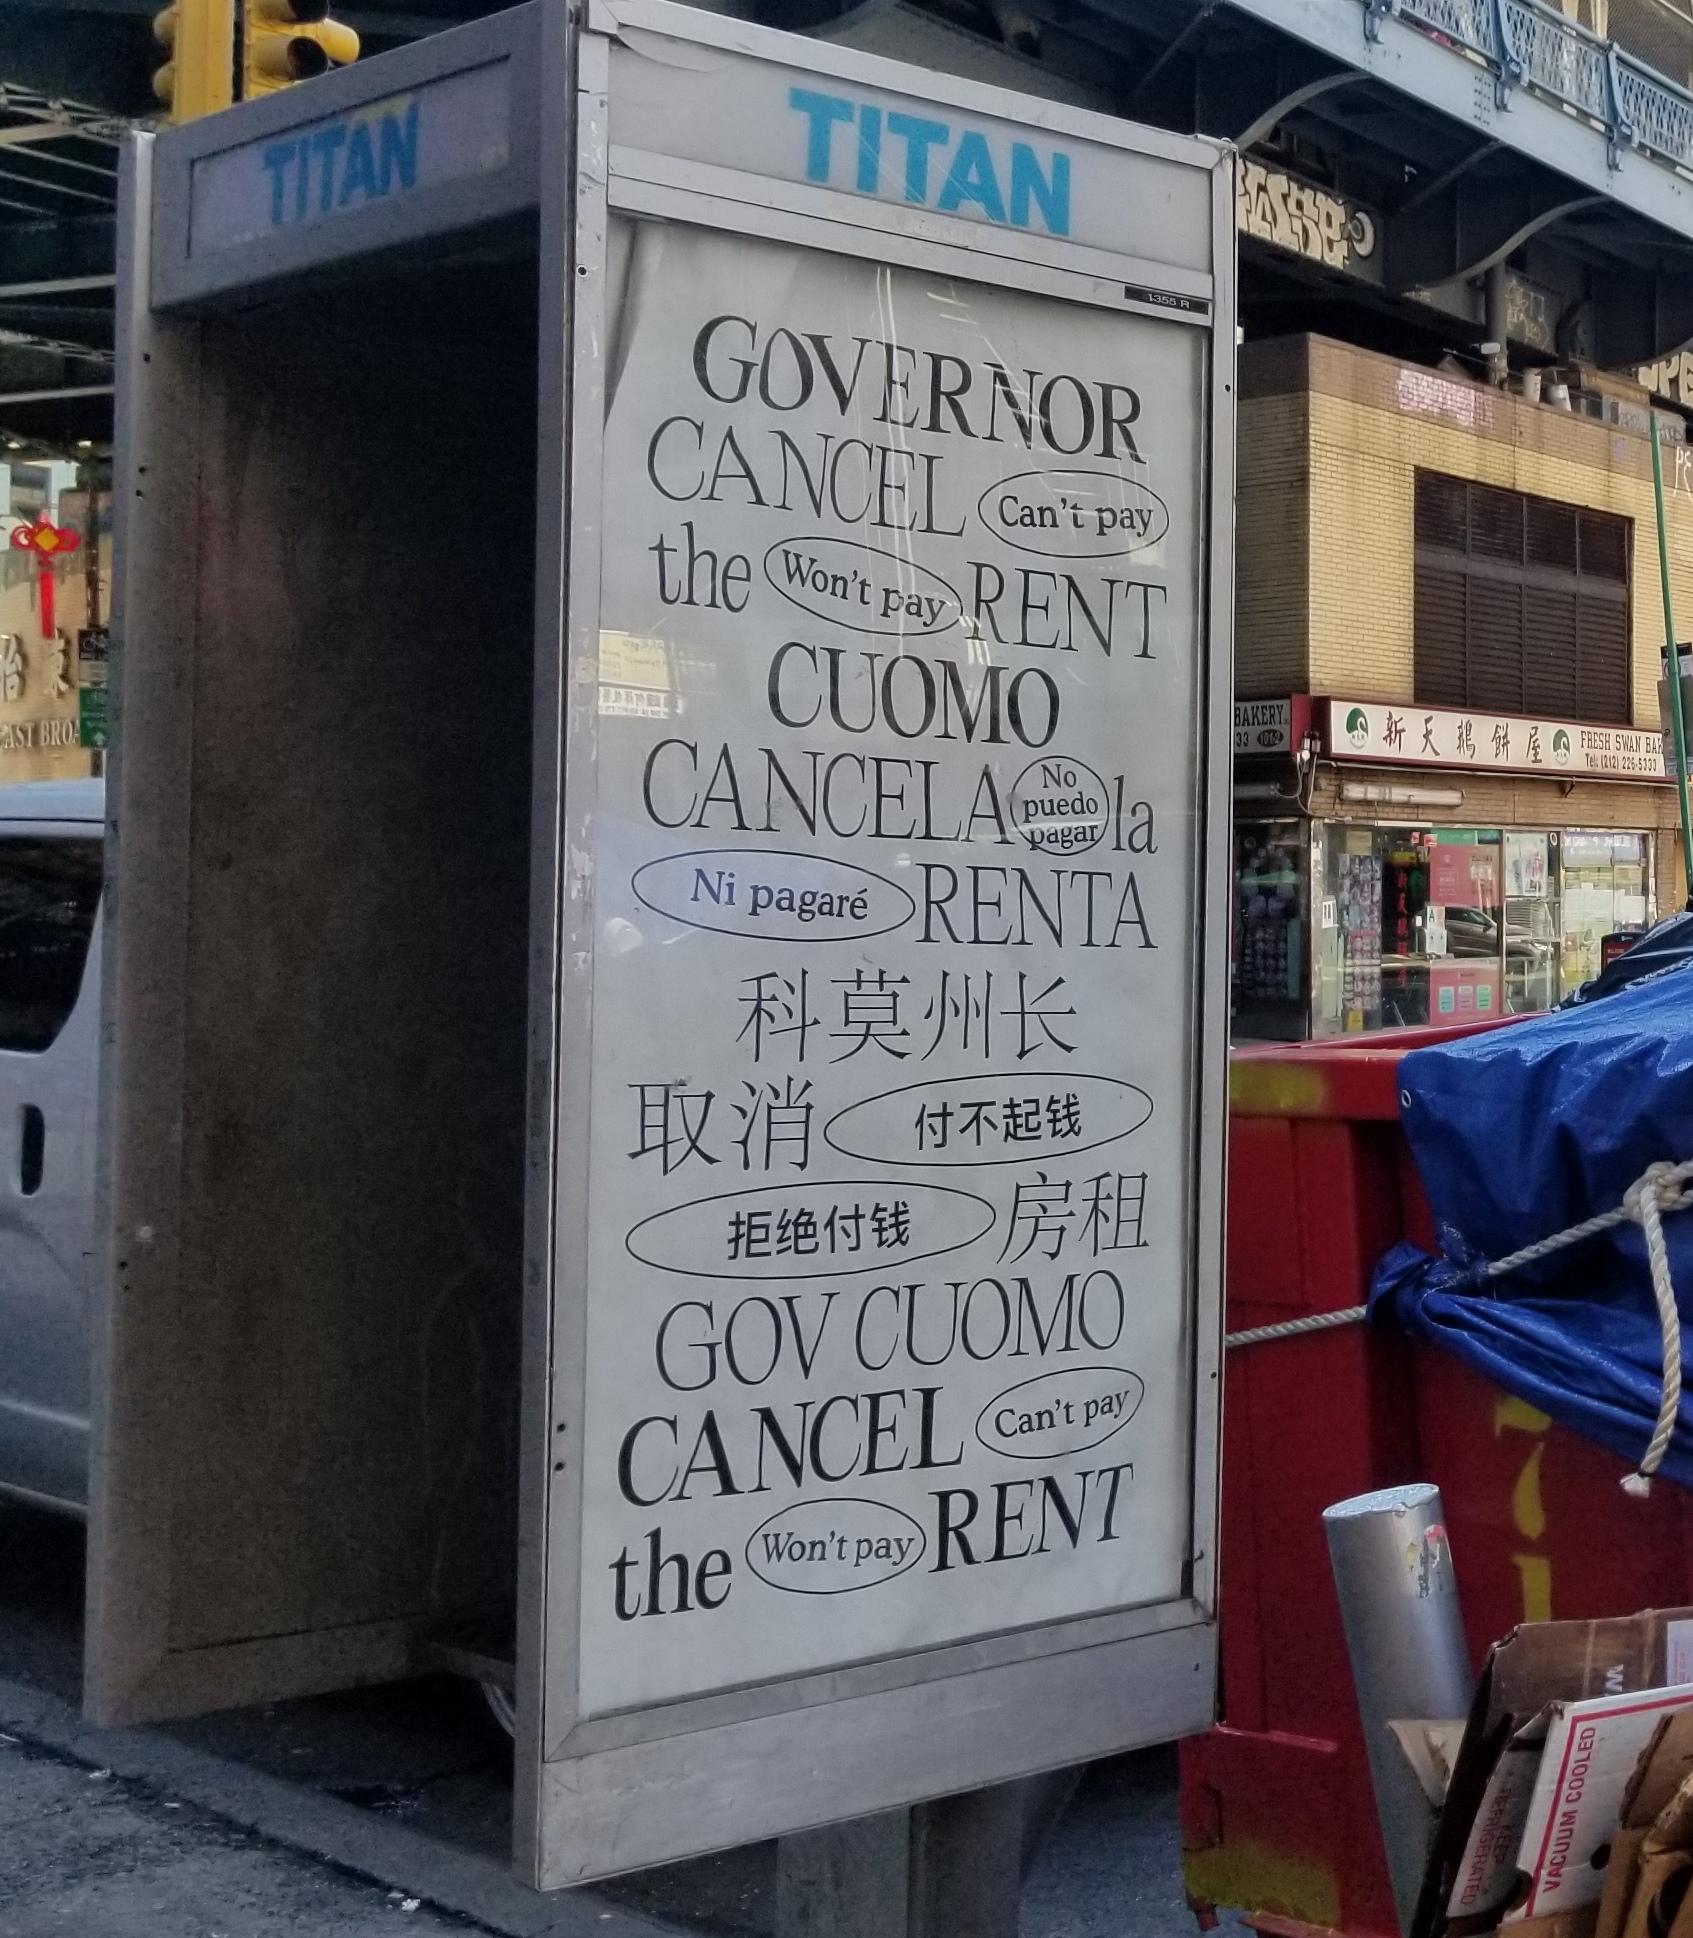 anti-rent poster